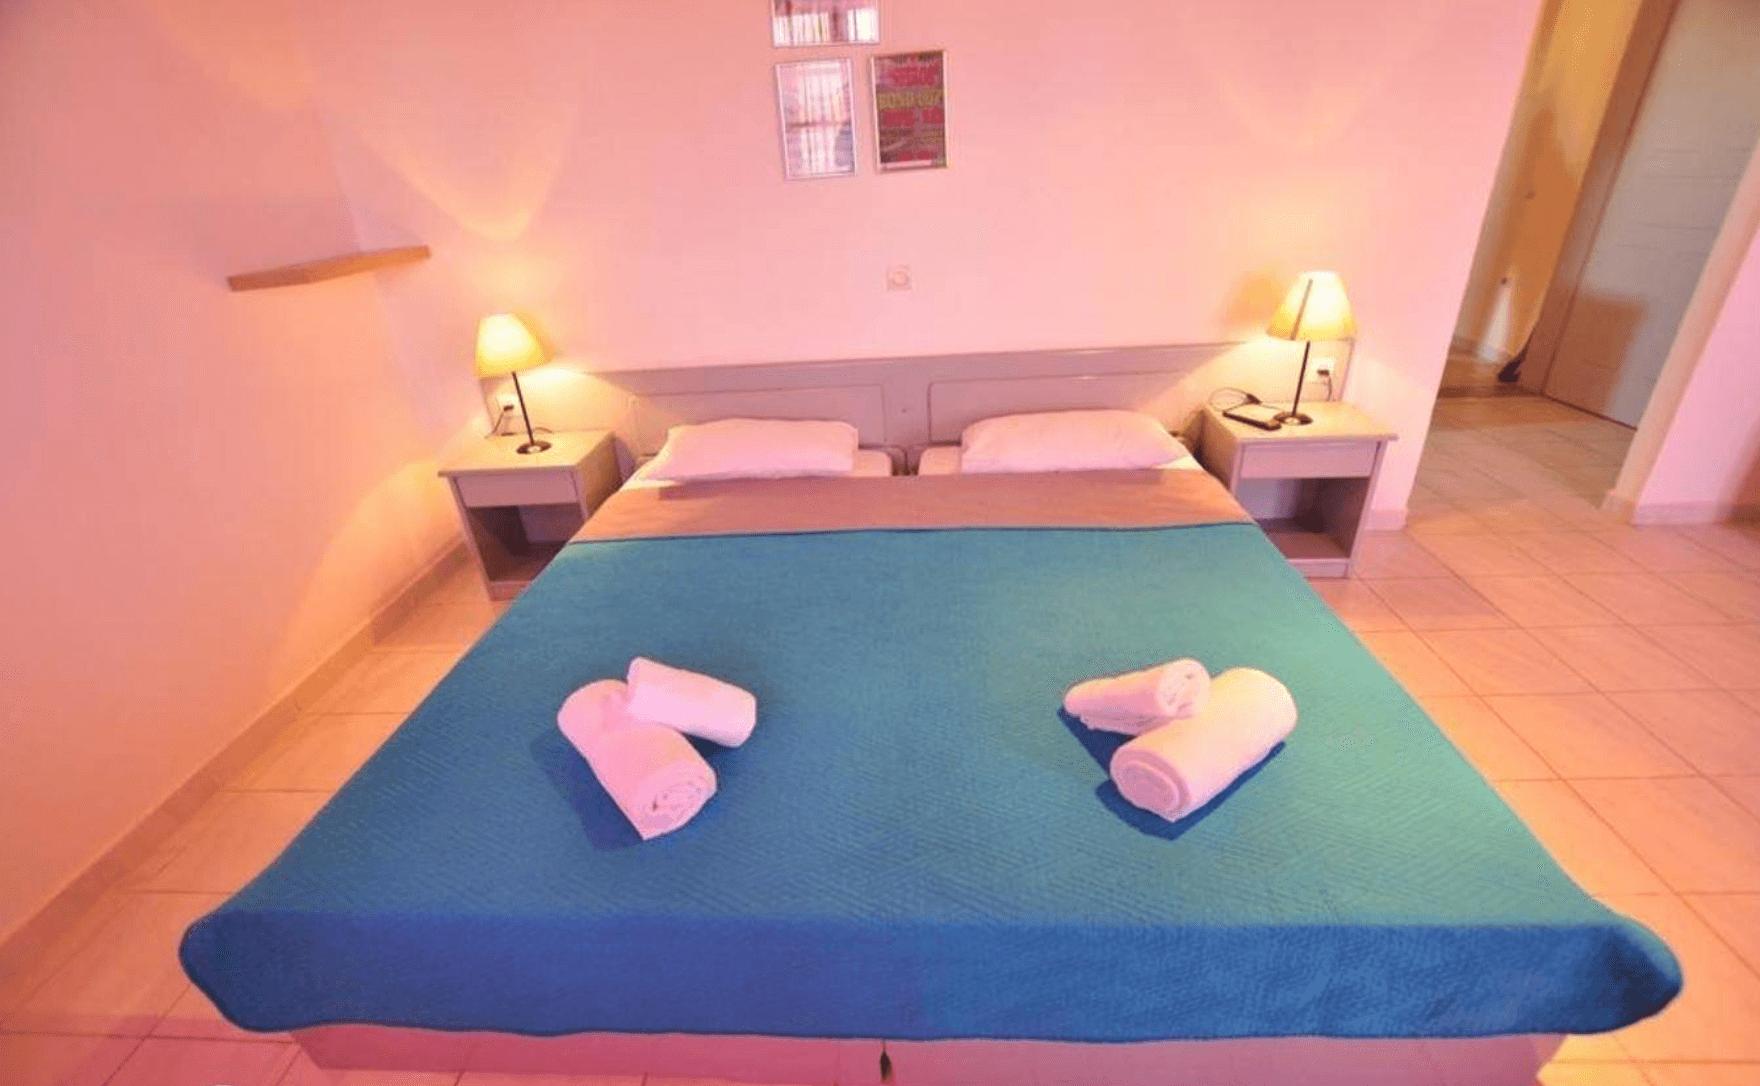 Тур на Корфу в Ахарави в отель Acharavi Garden 3* (Греция) на 7 ночей с 24.09.19 от 39 262 рублей (RO) на двоих